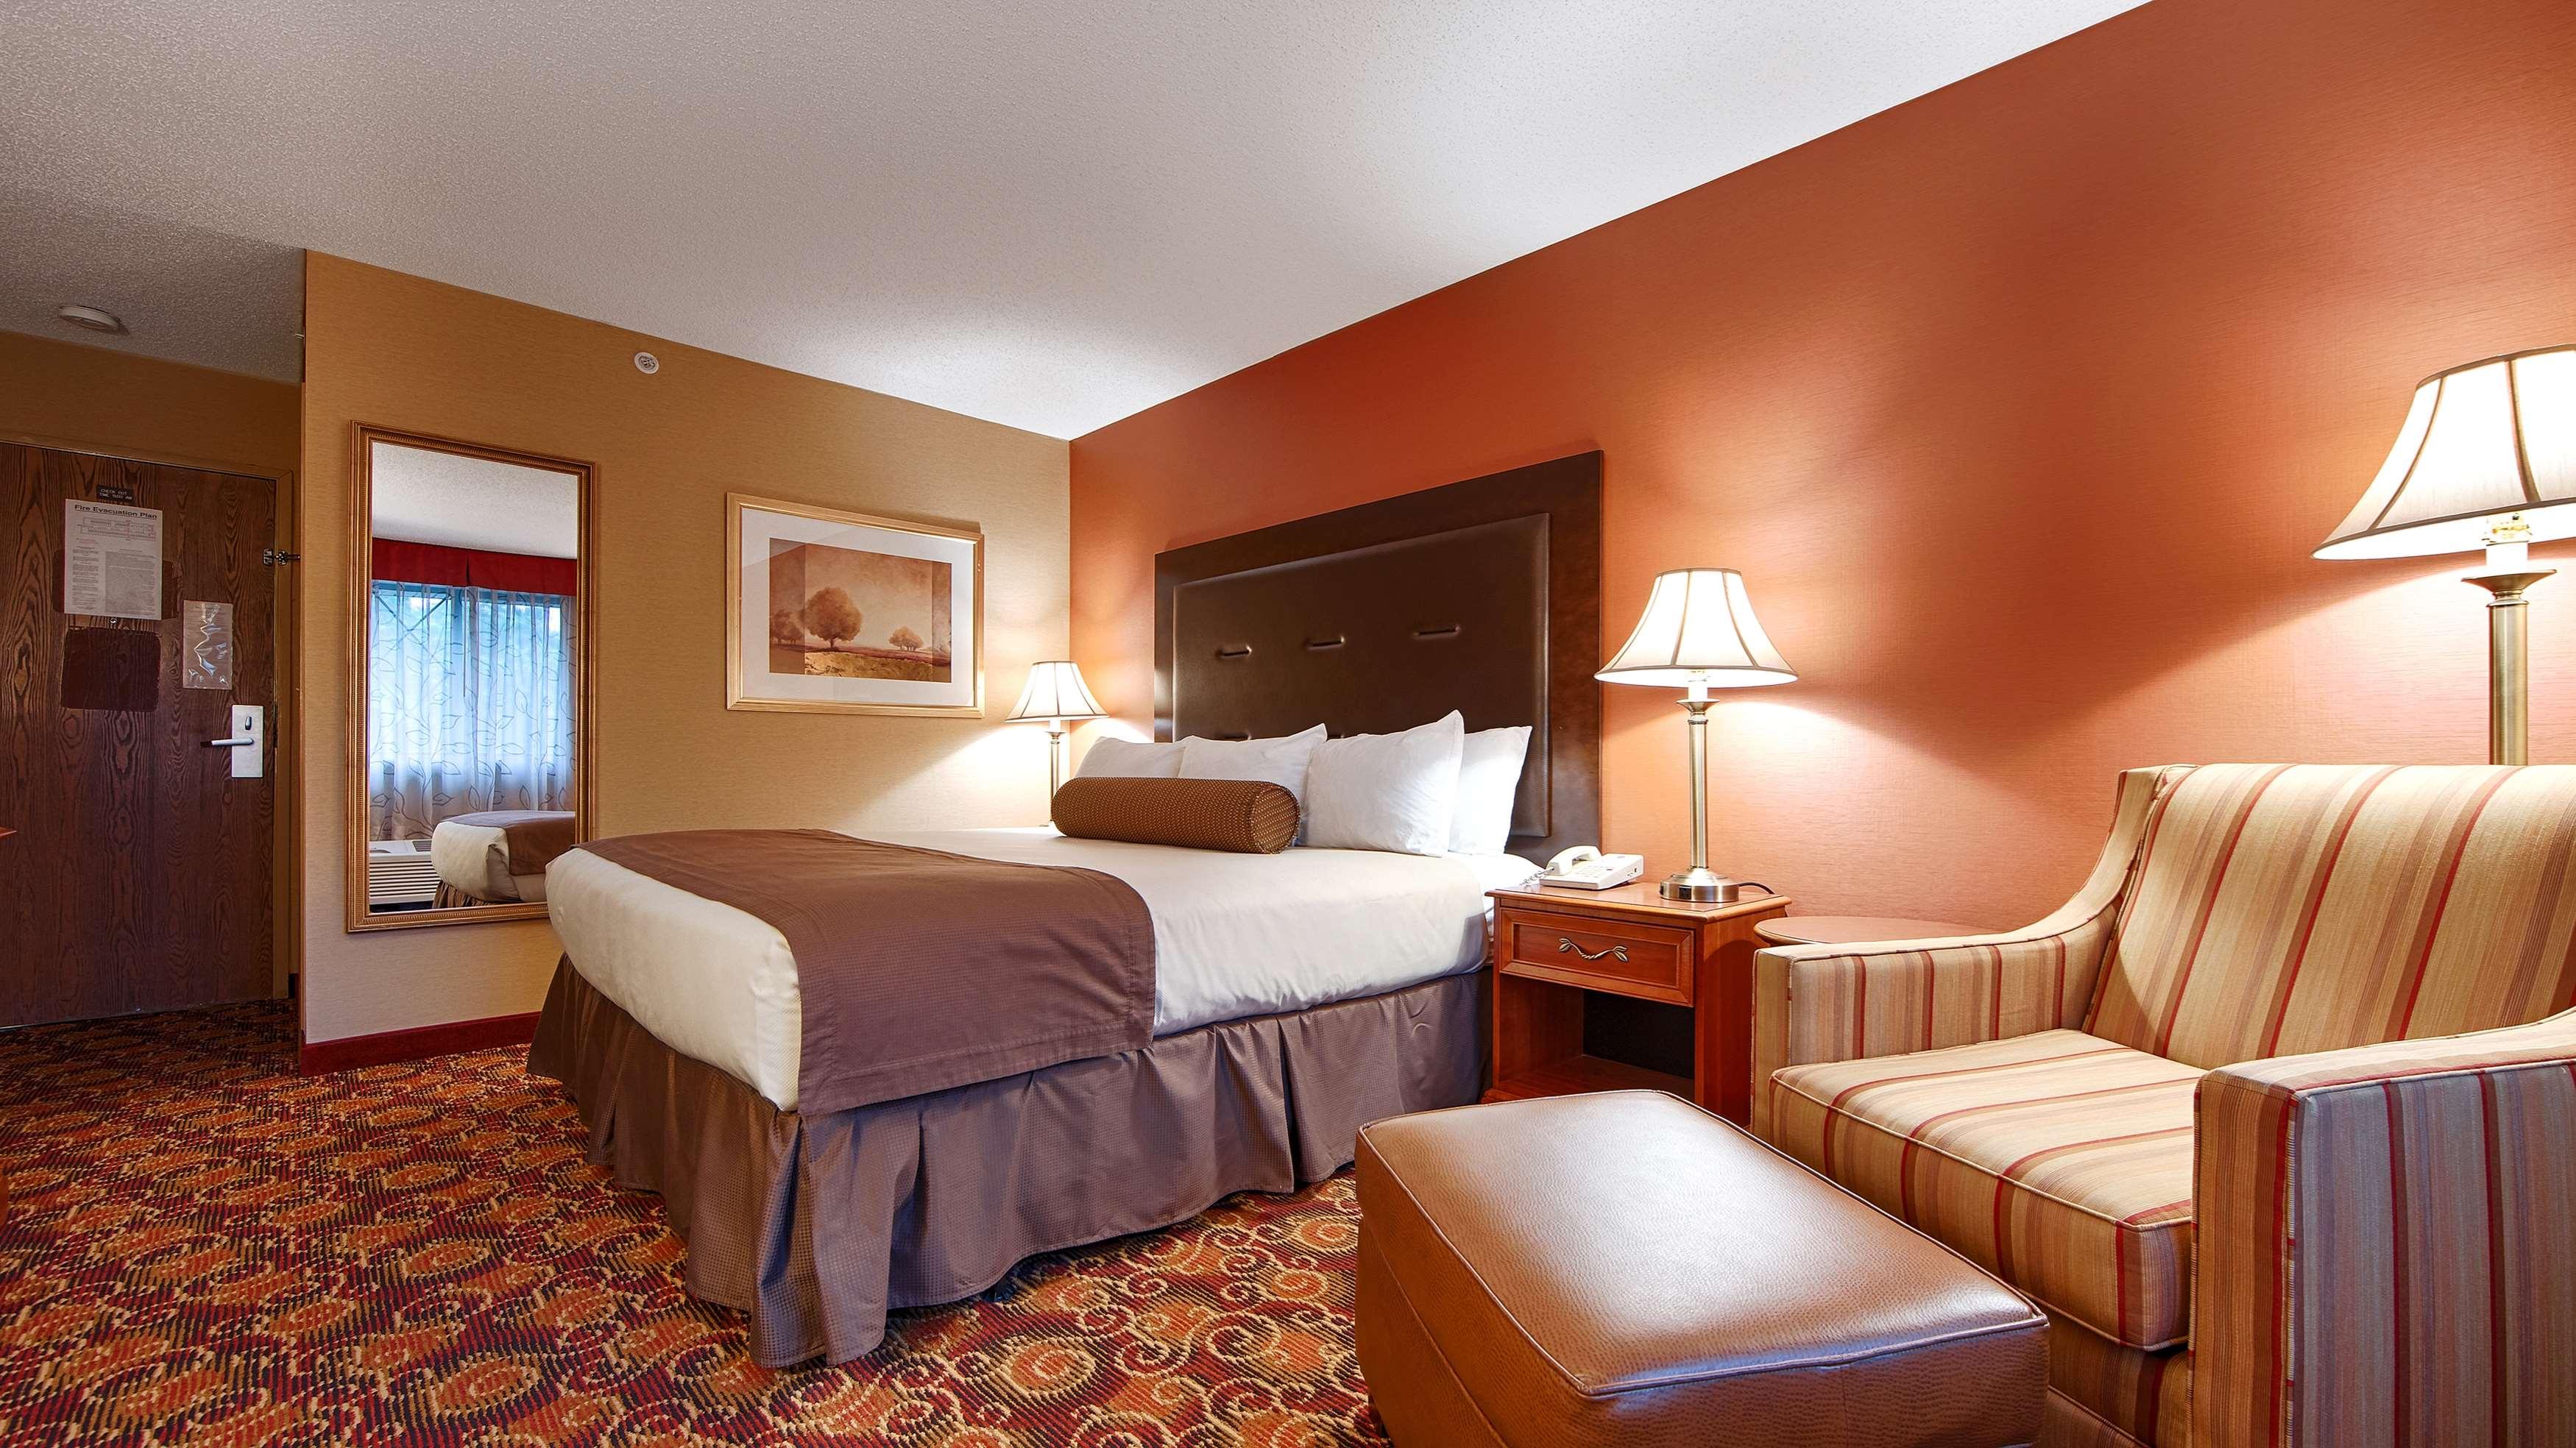 Best Western Plus The Inn at Sharon/Foxboro image 10